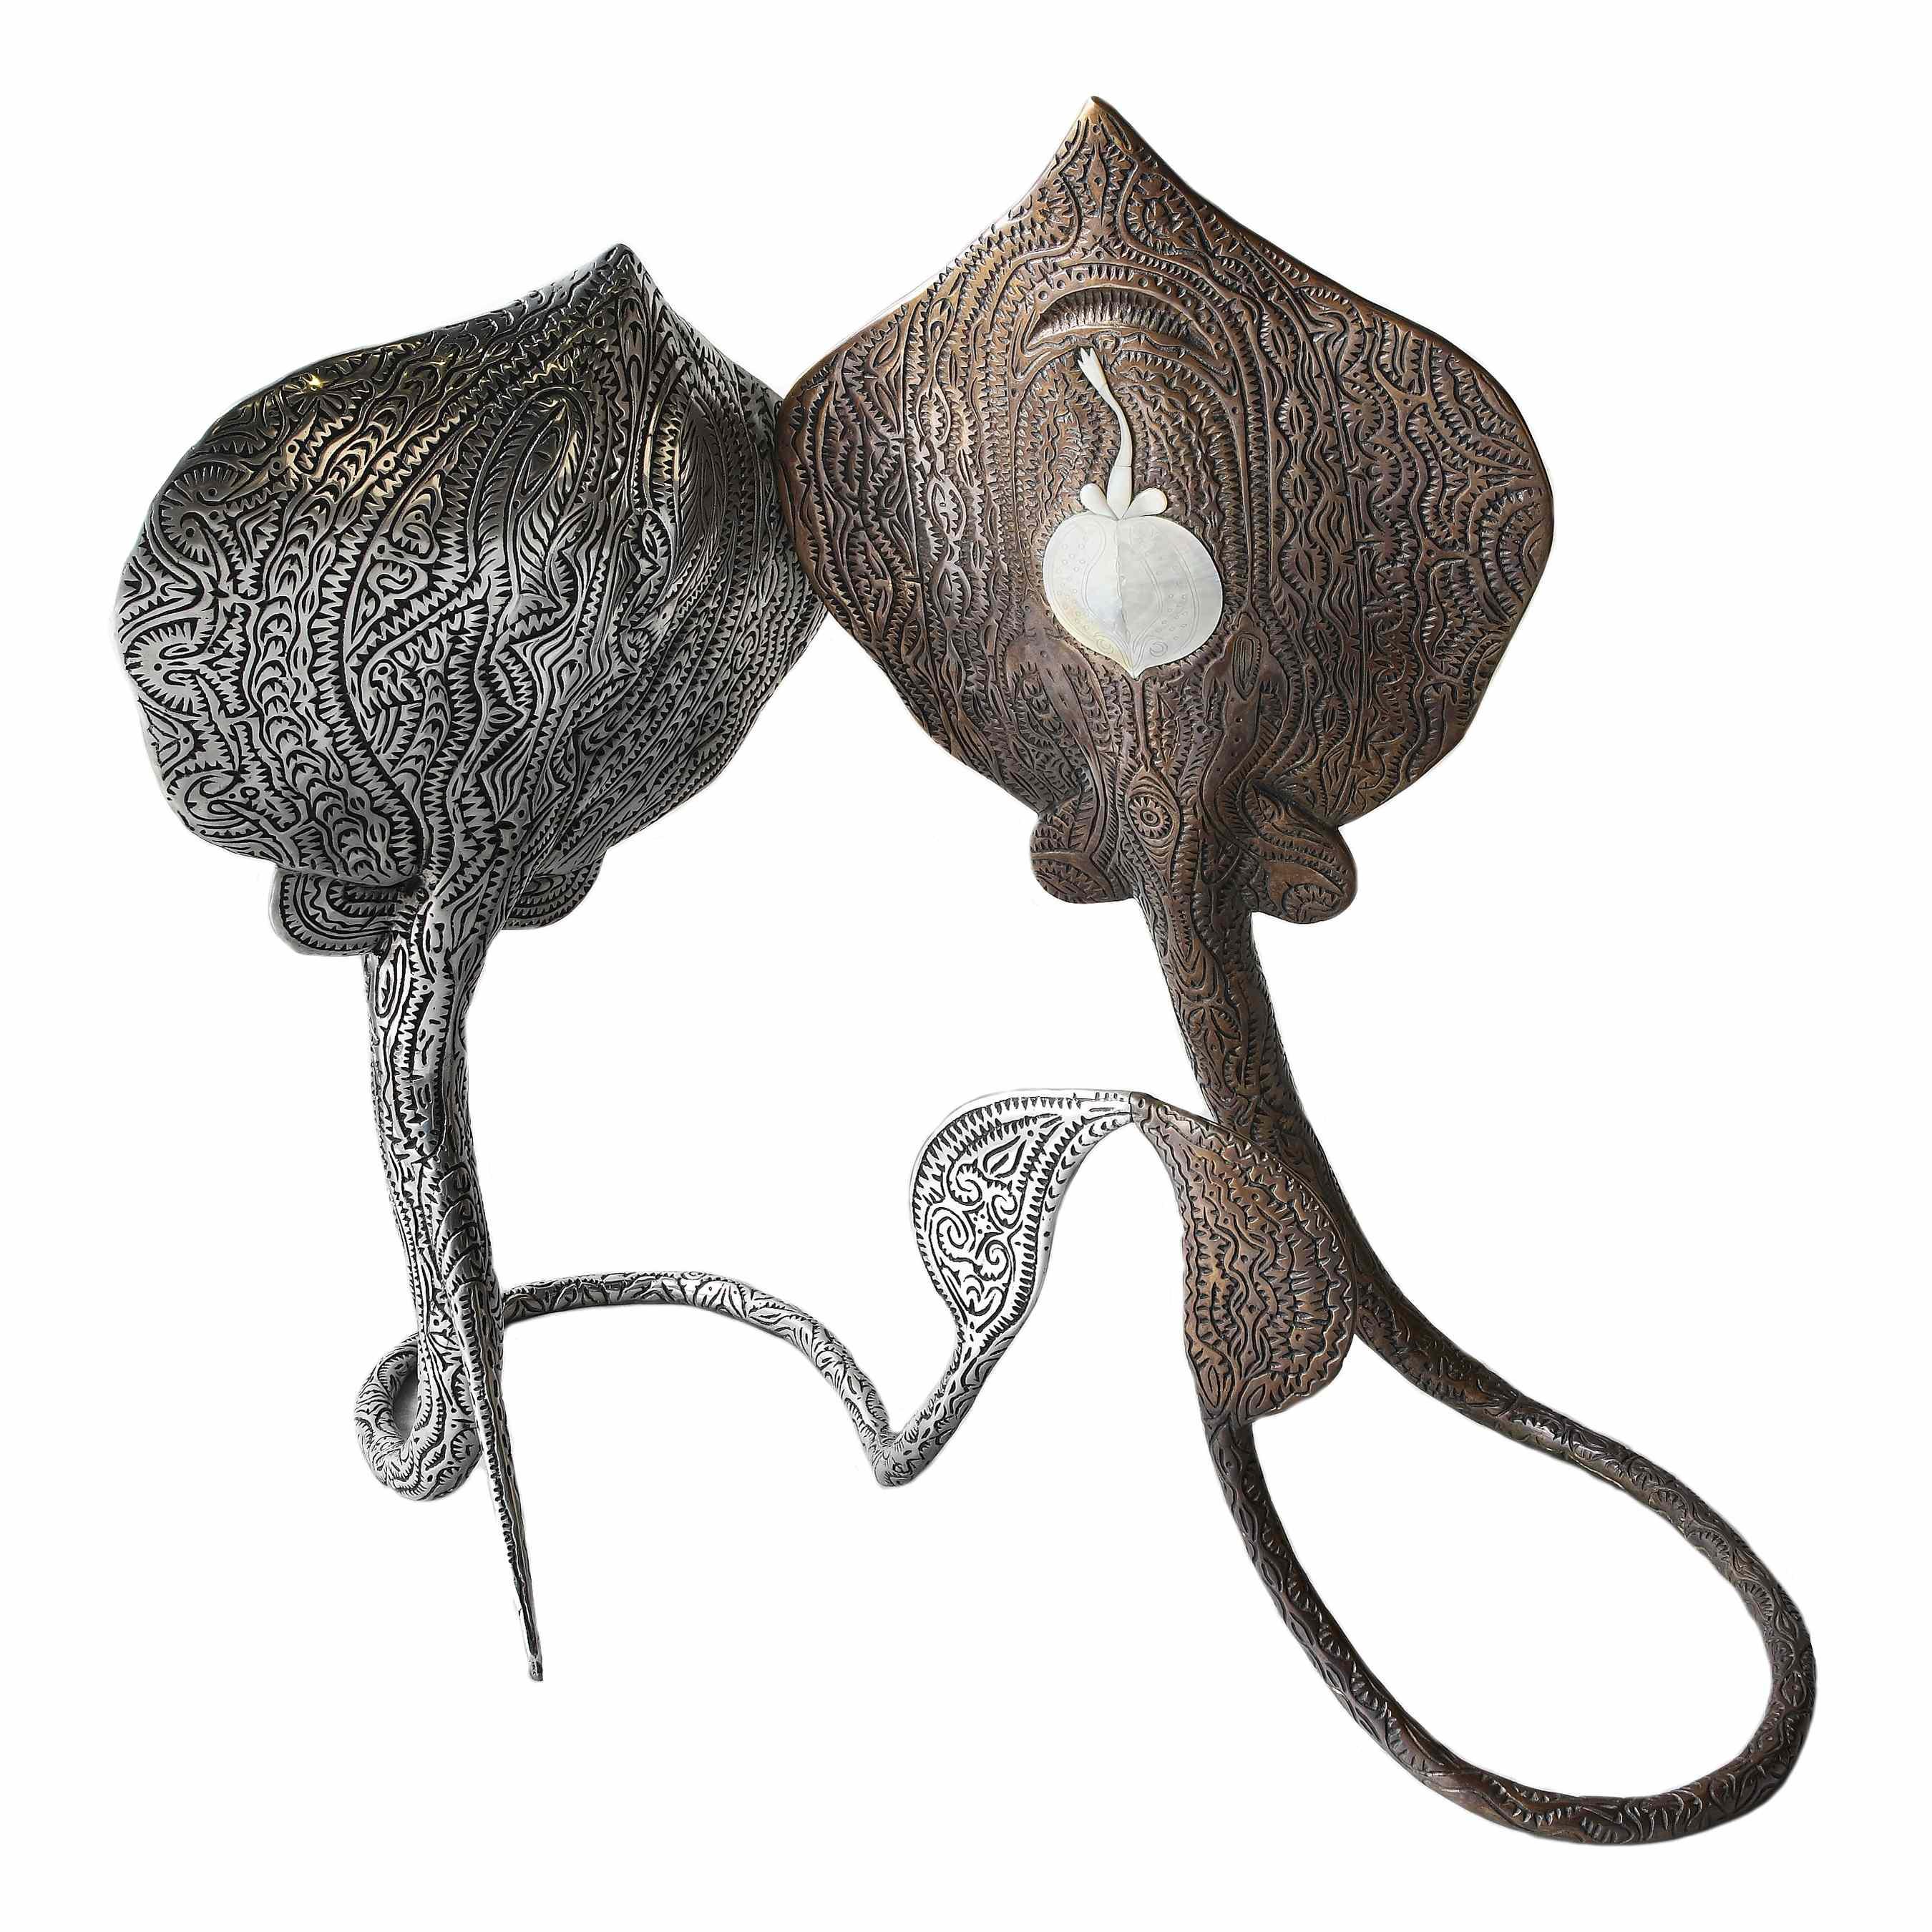 Gubuka, aluminium et bronze avec incrustation@de nacre, éd. 5/12, 106 x 88 x 82 cm